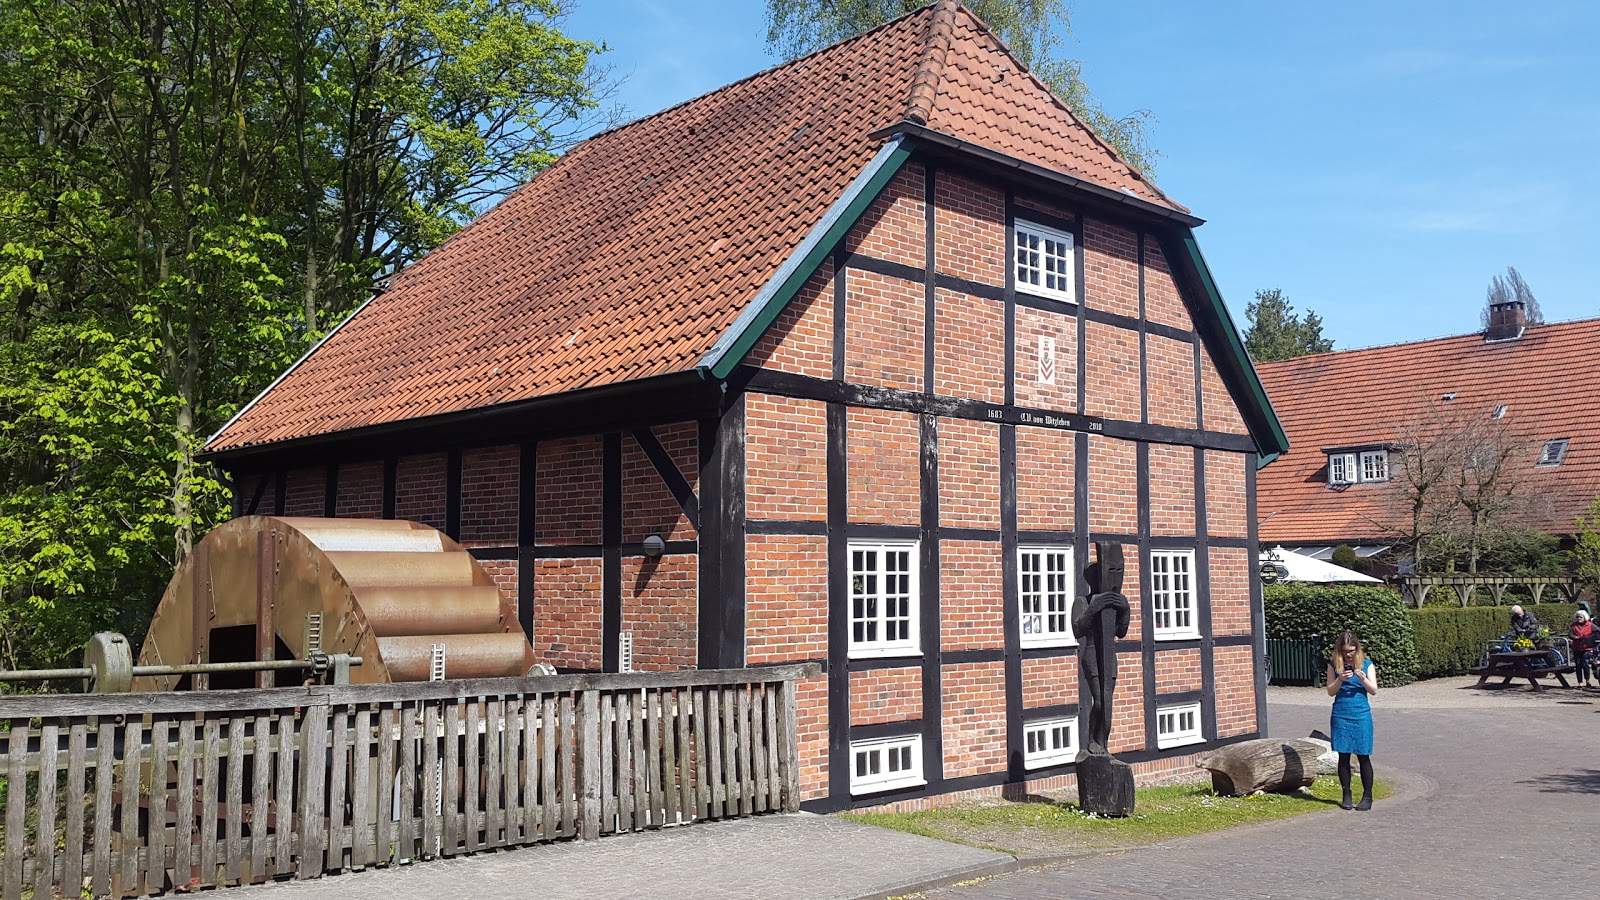 Klosterschänke Hude - Delmenhorst, Germany - Tripcarta